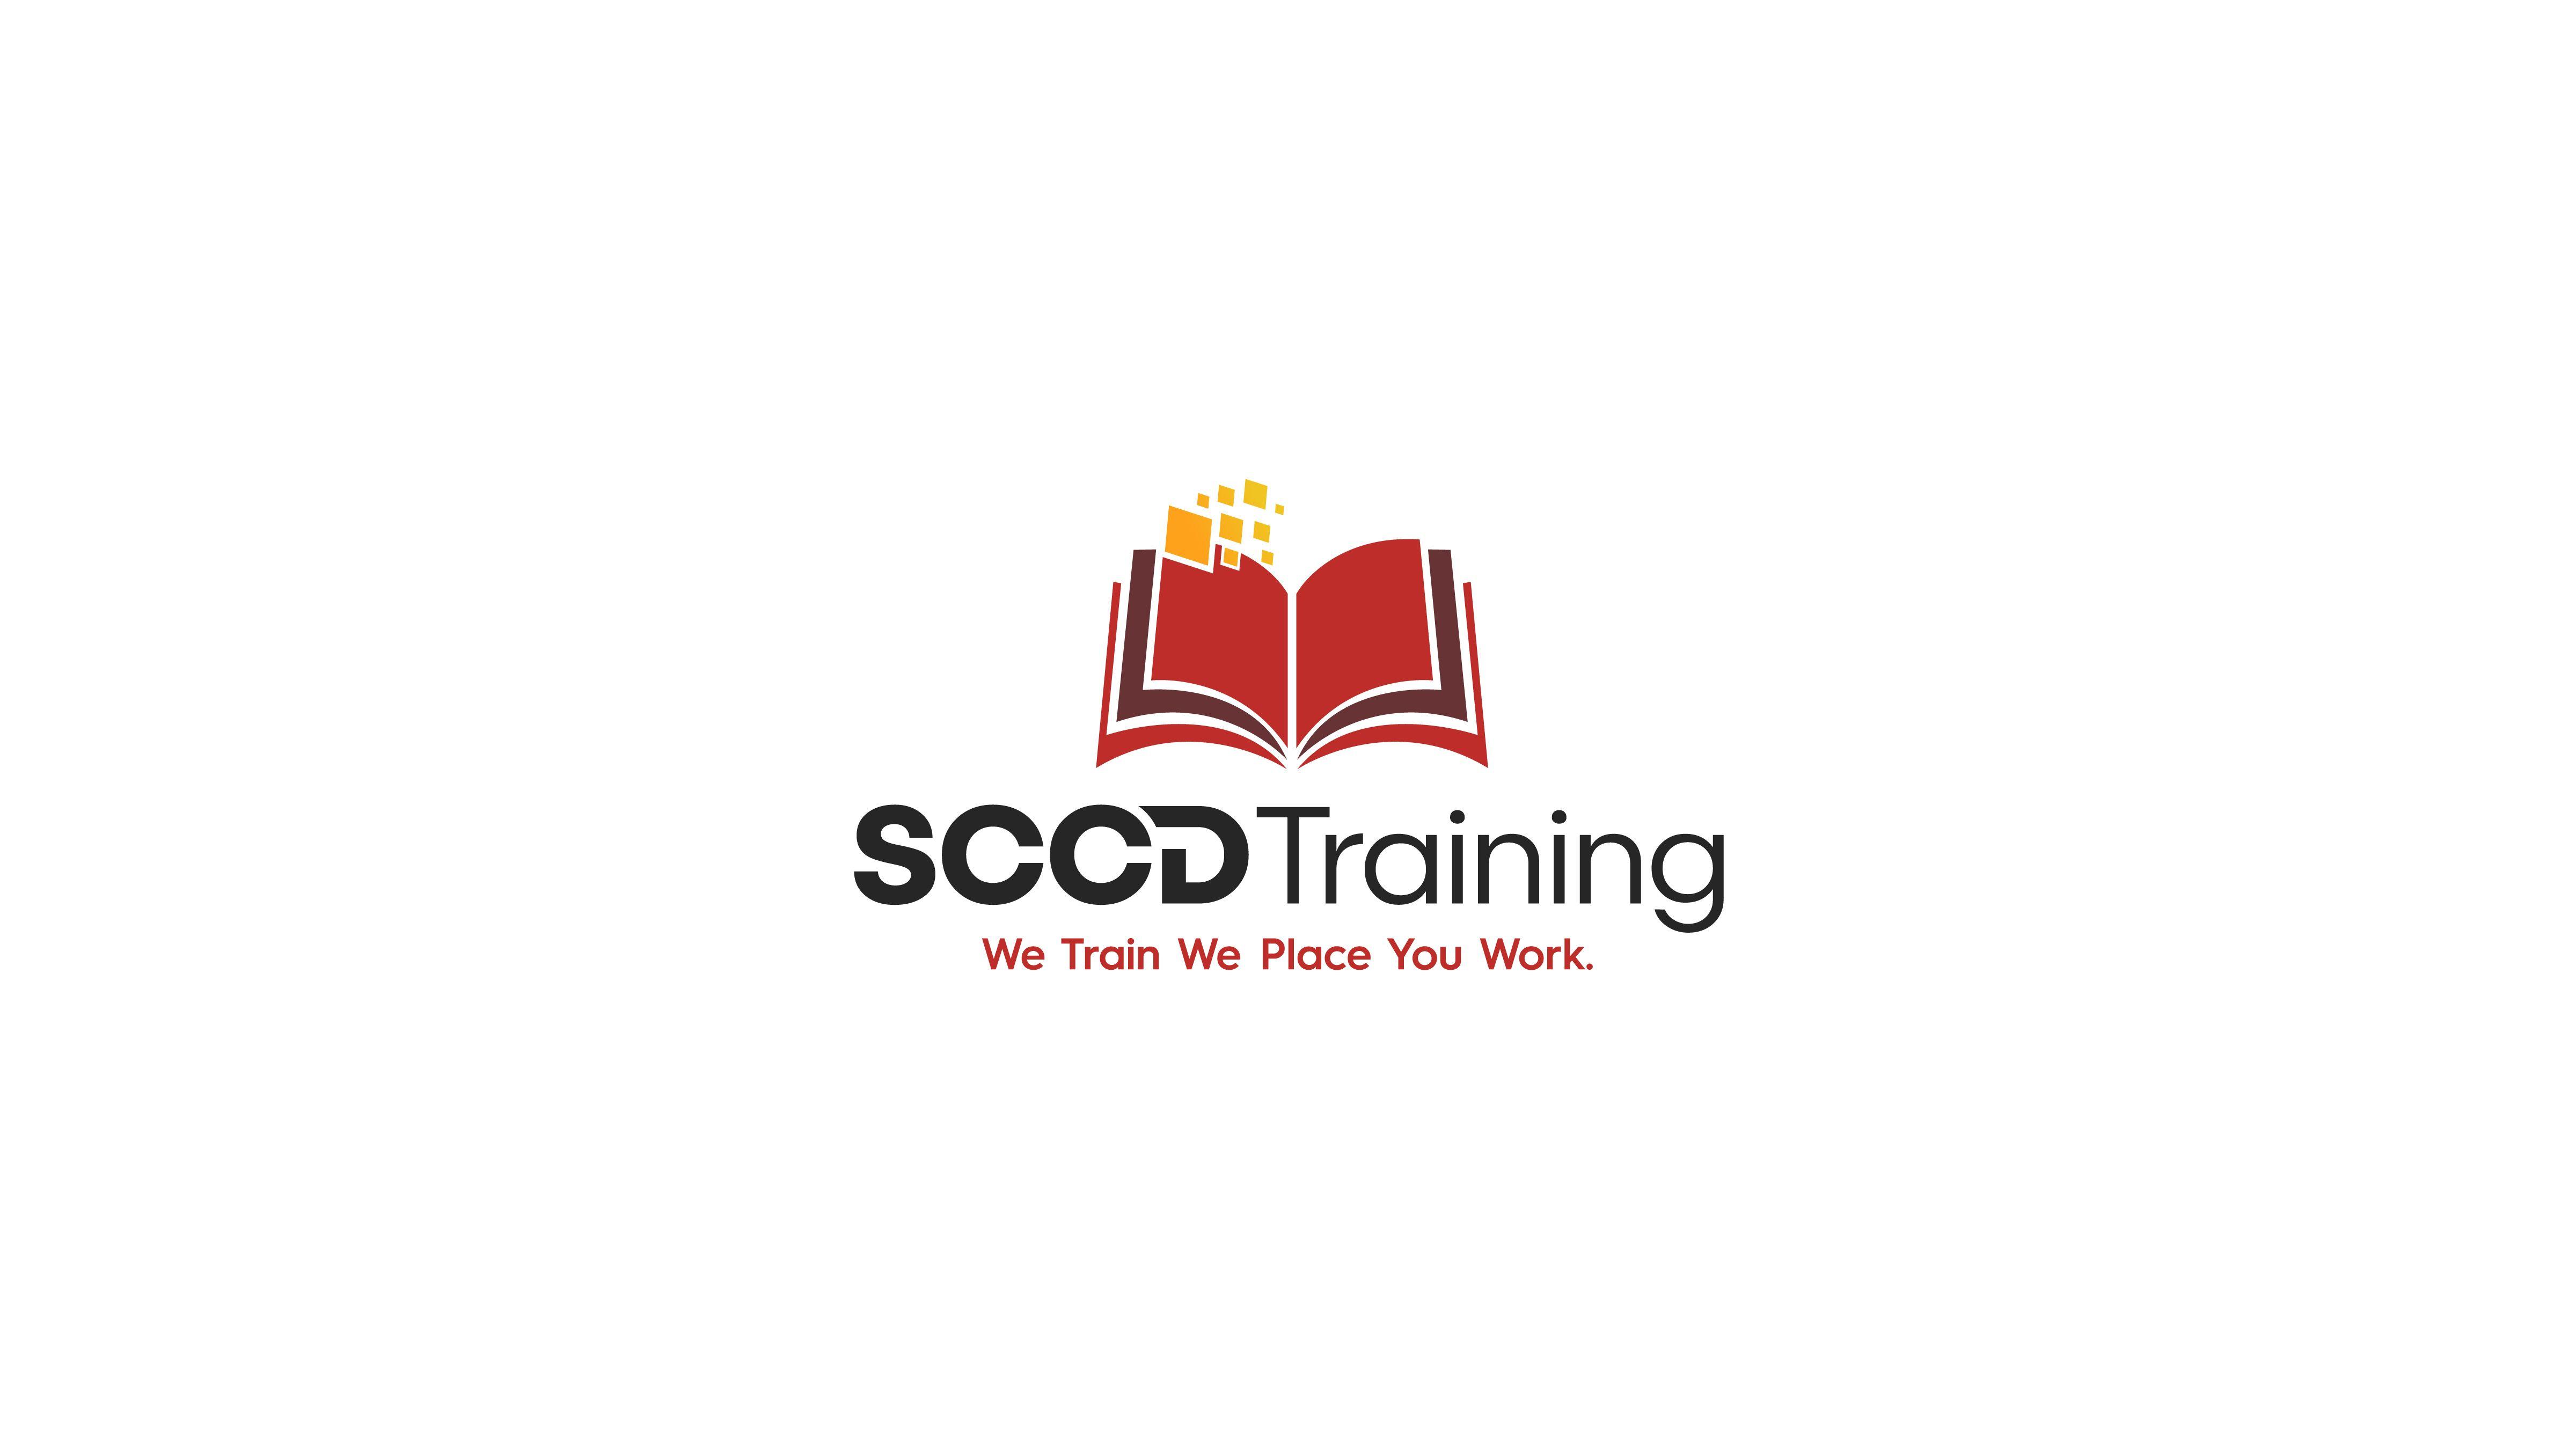 SCCD Training